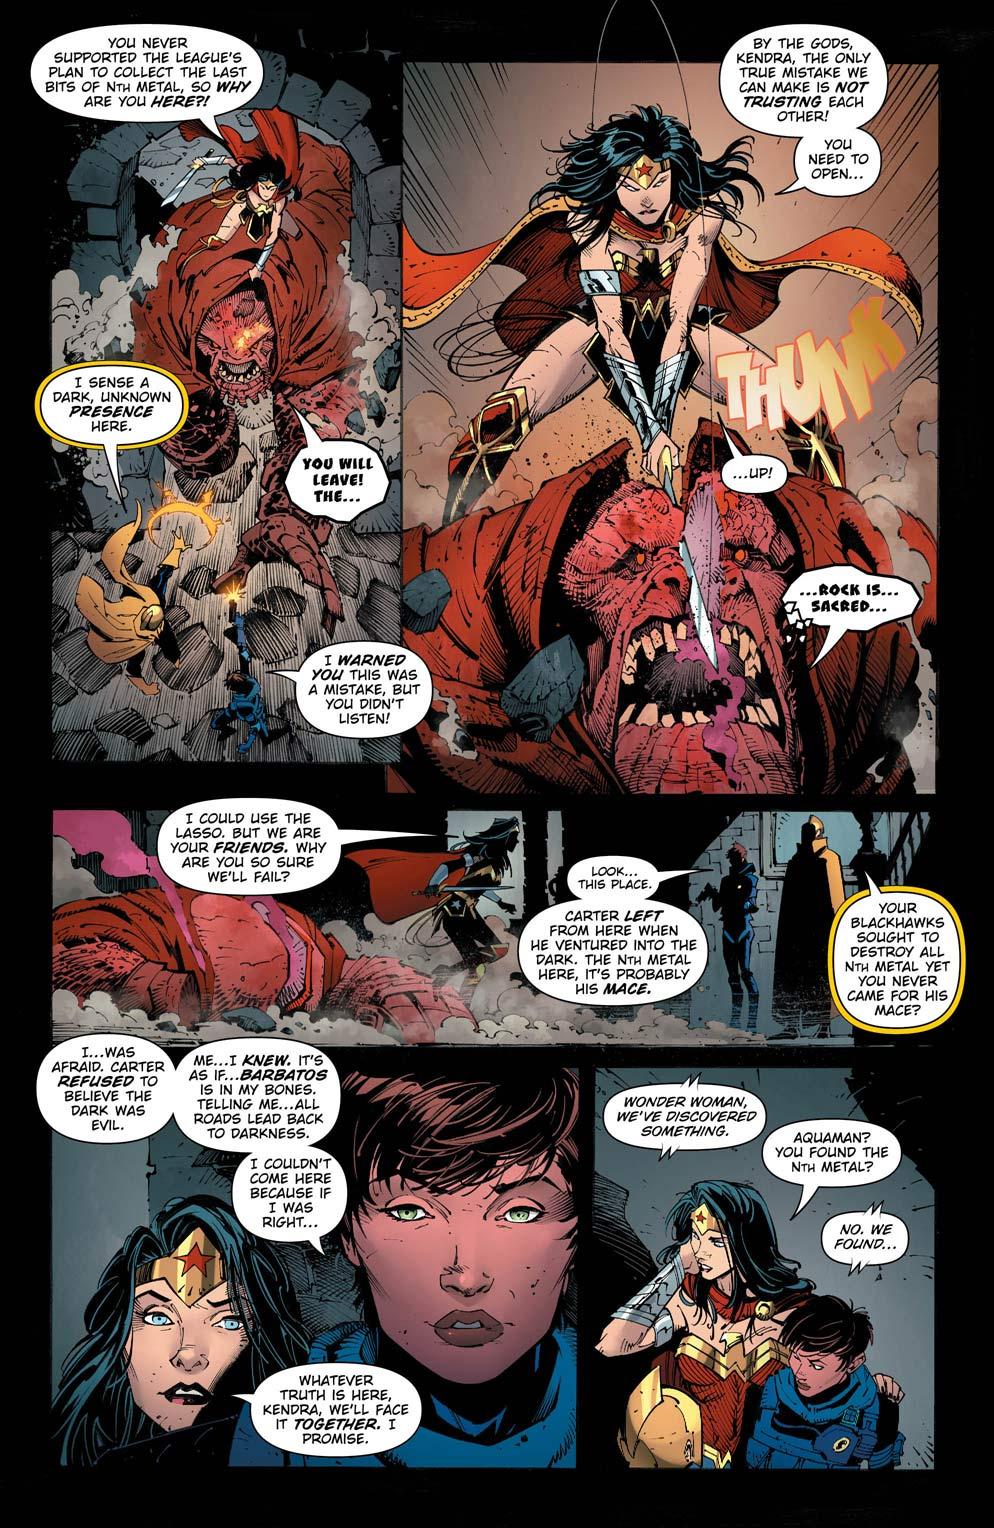 Dark Nights Metal 4_5 - DC Comics News